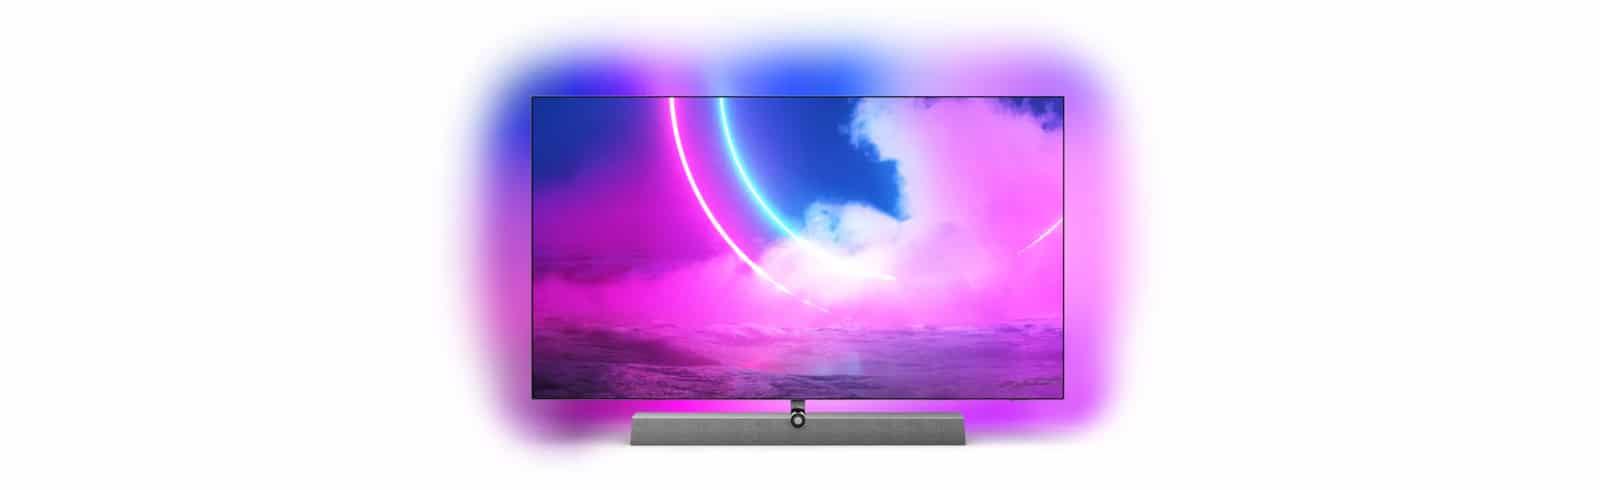 Smart TV Philips OLED+935